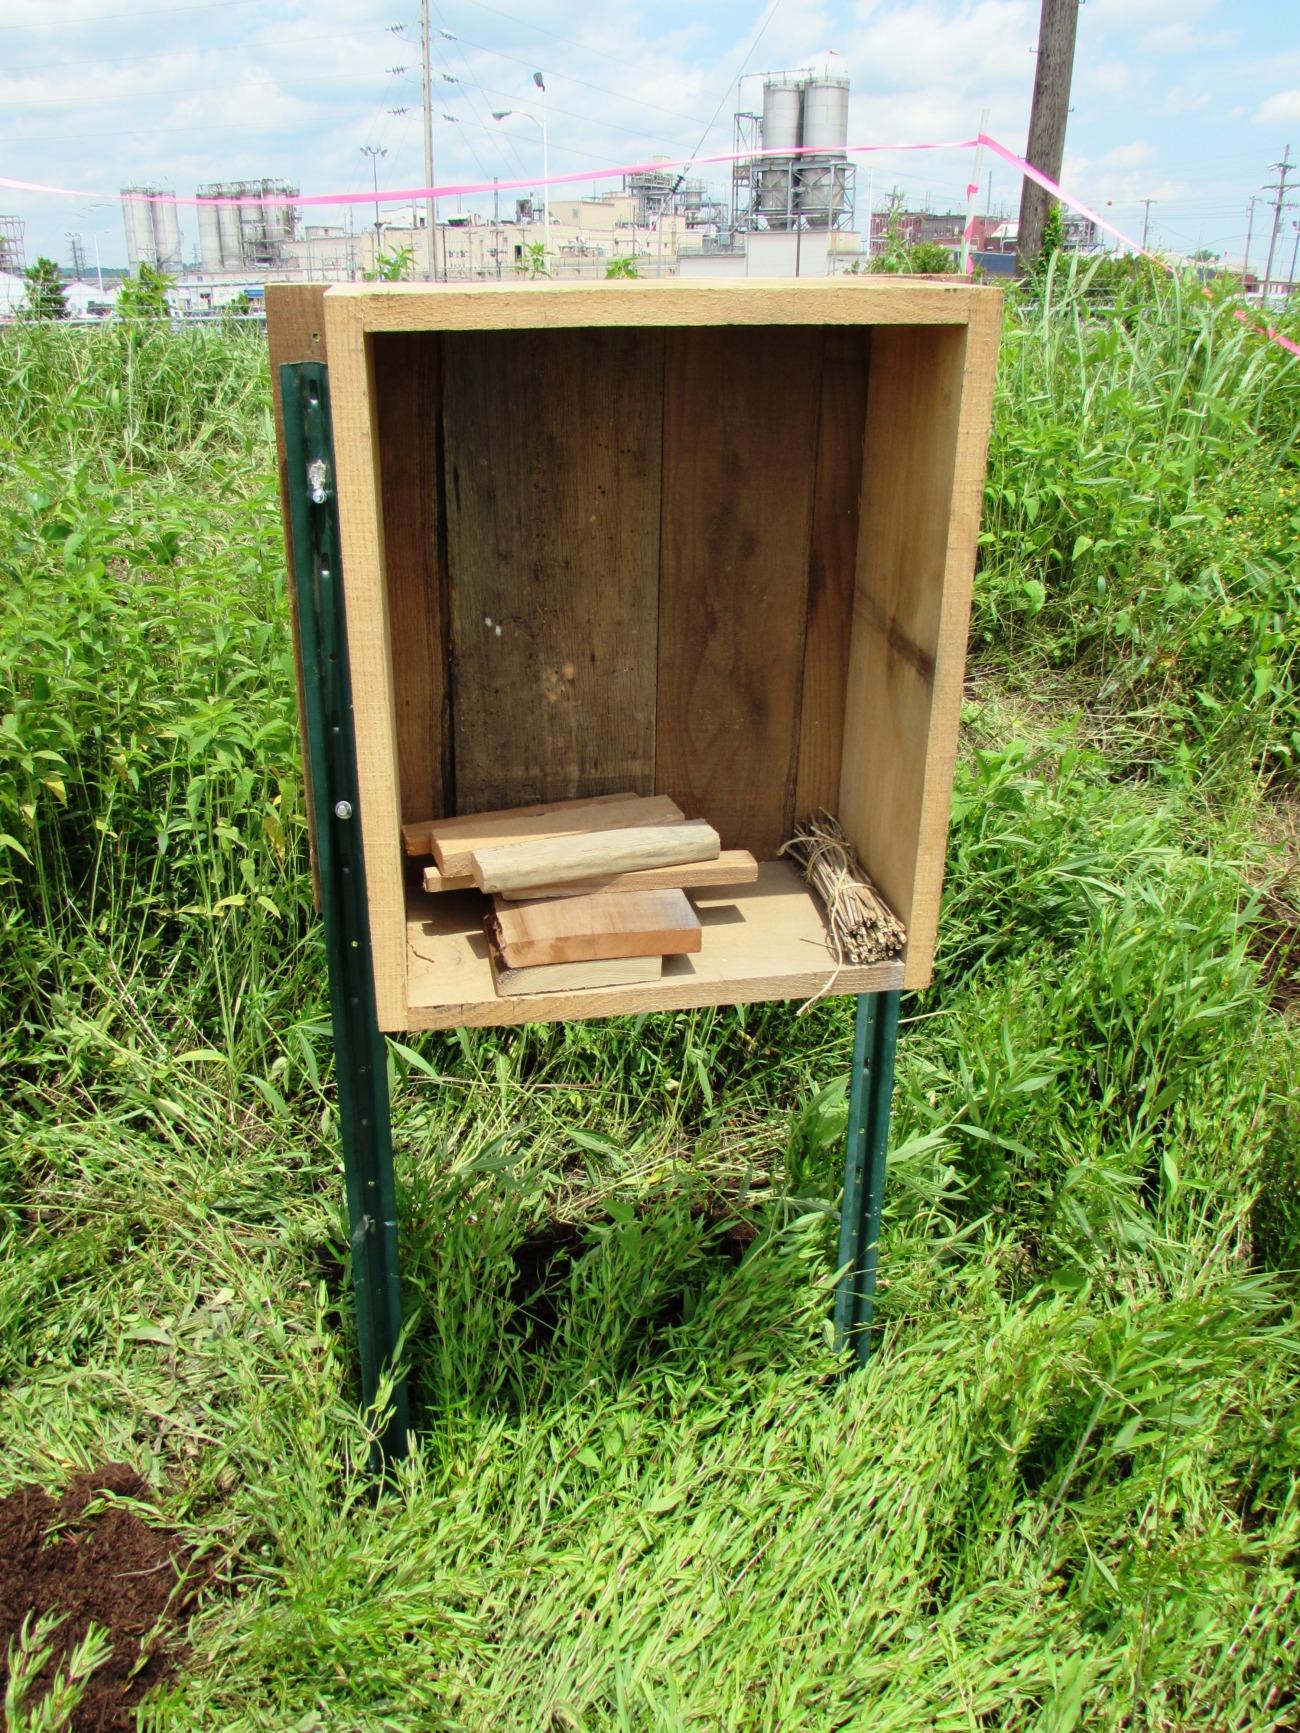 Building a Pollinator Hotel